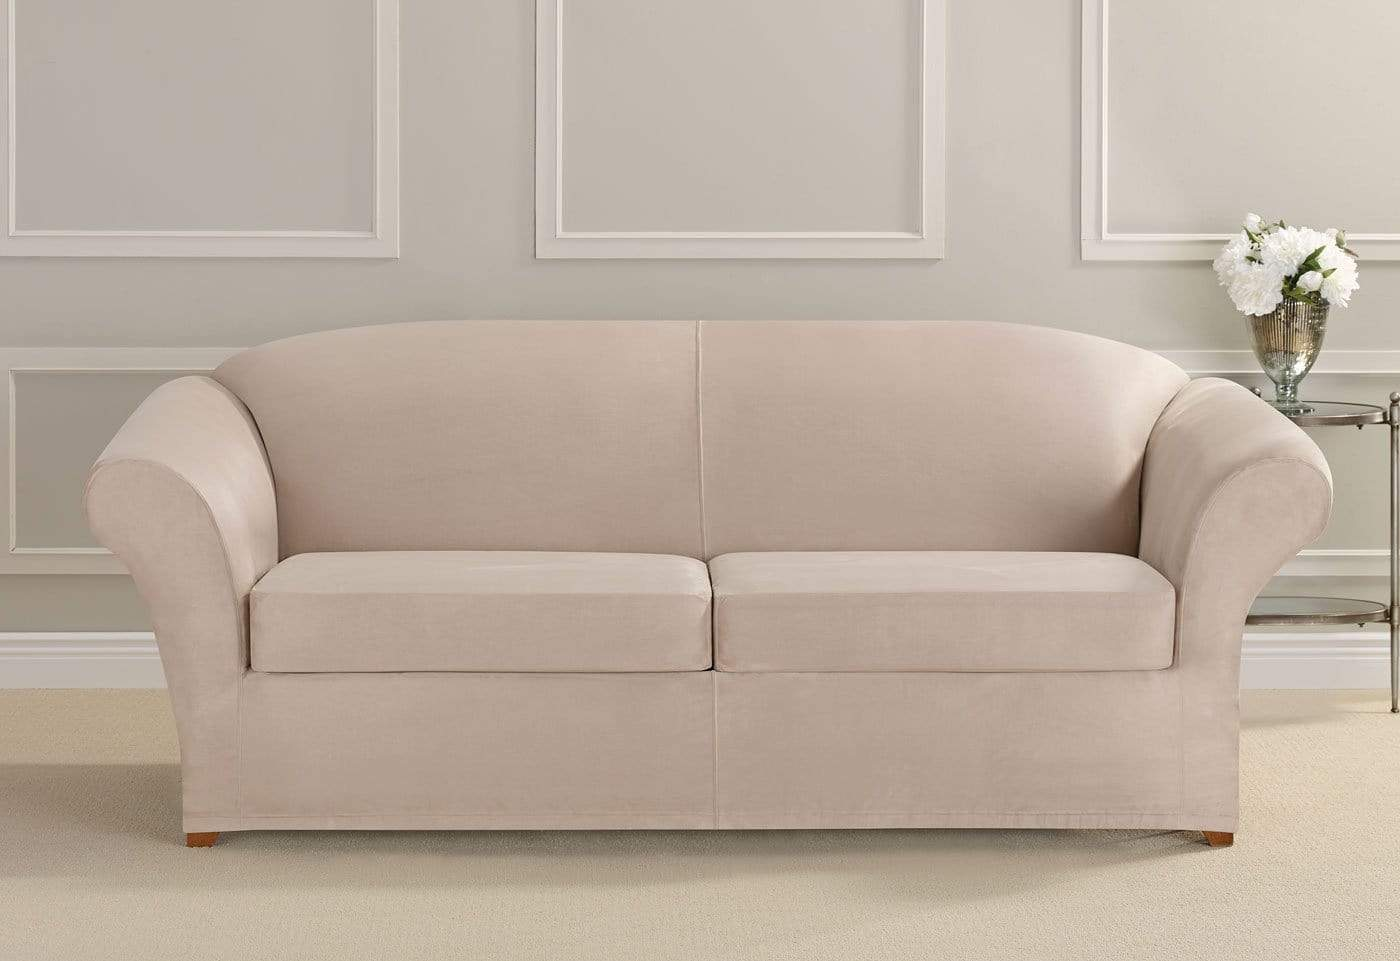 stretch morgan 1 piece sofa furniture cover high leg ultimate heavyweight suede three slipcover surefit